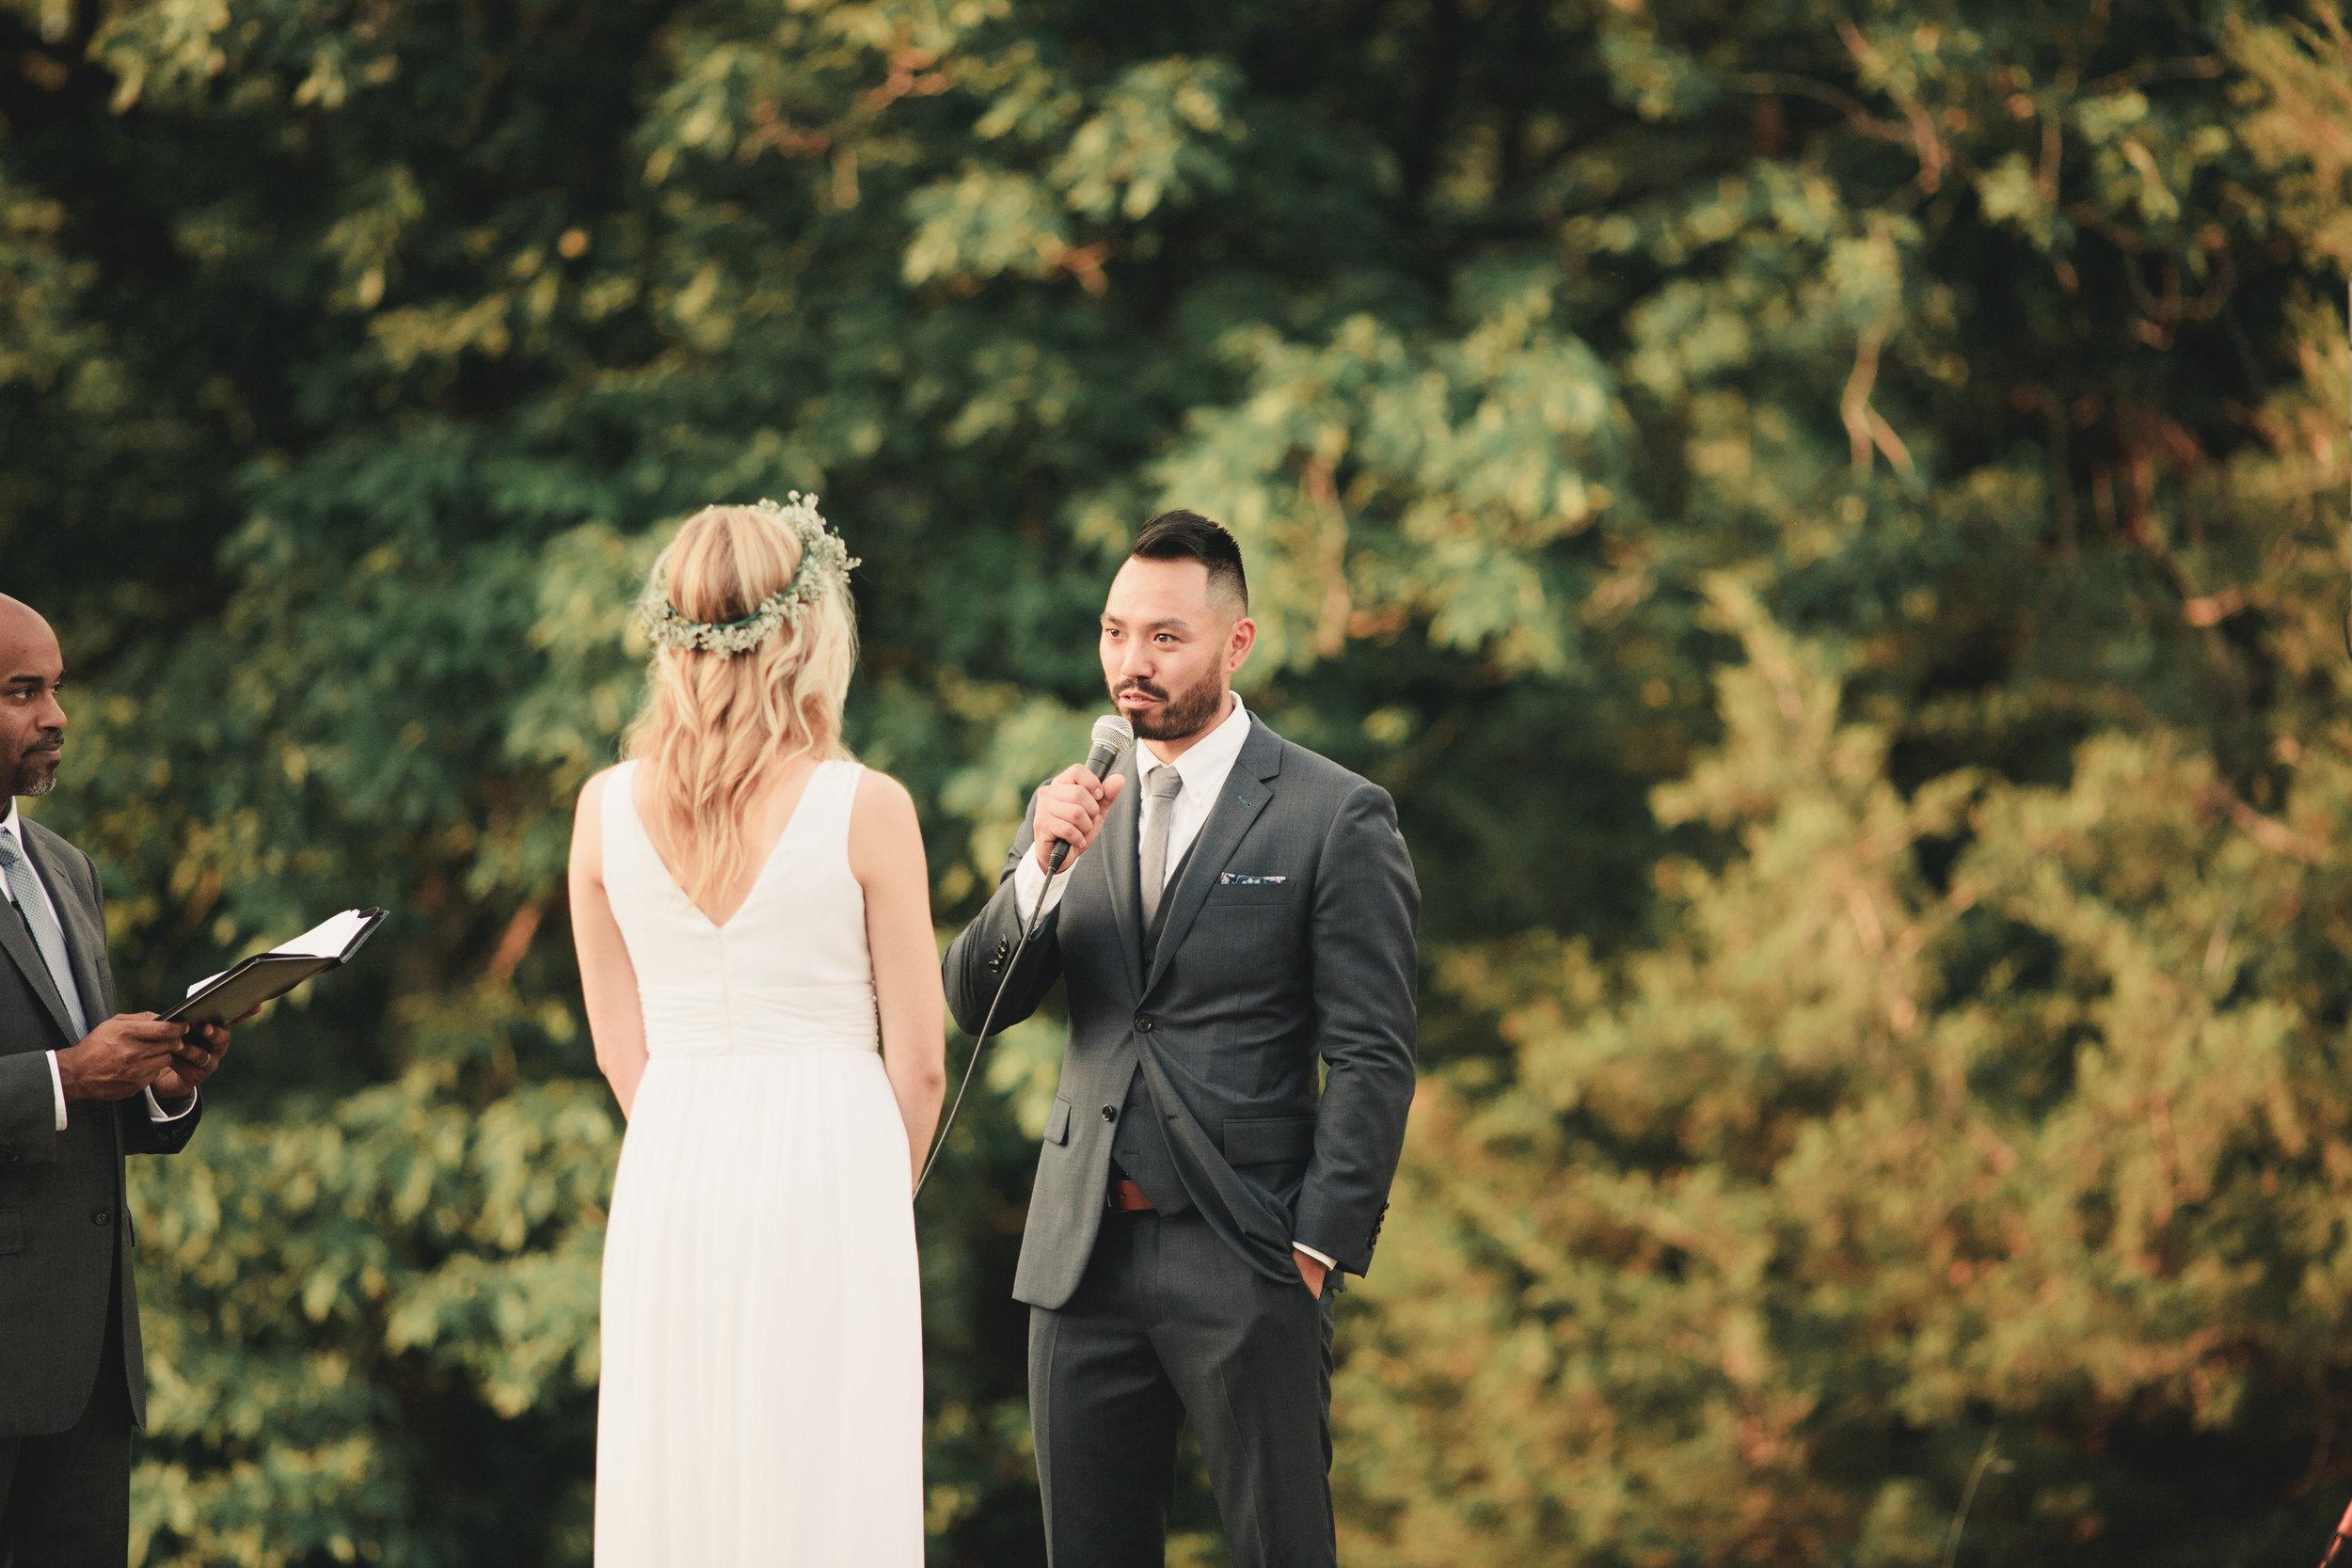 Emily and Zach-Wedding Finals 2-0067.jpg